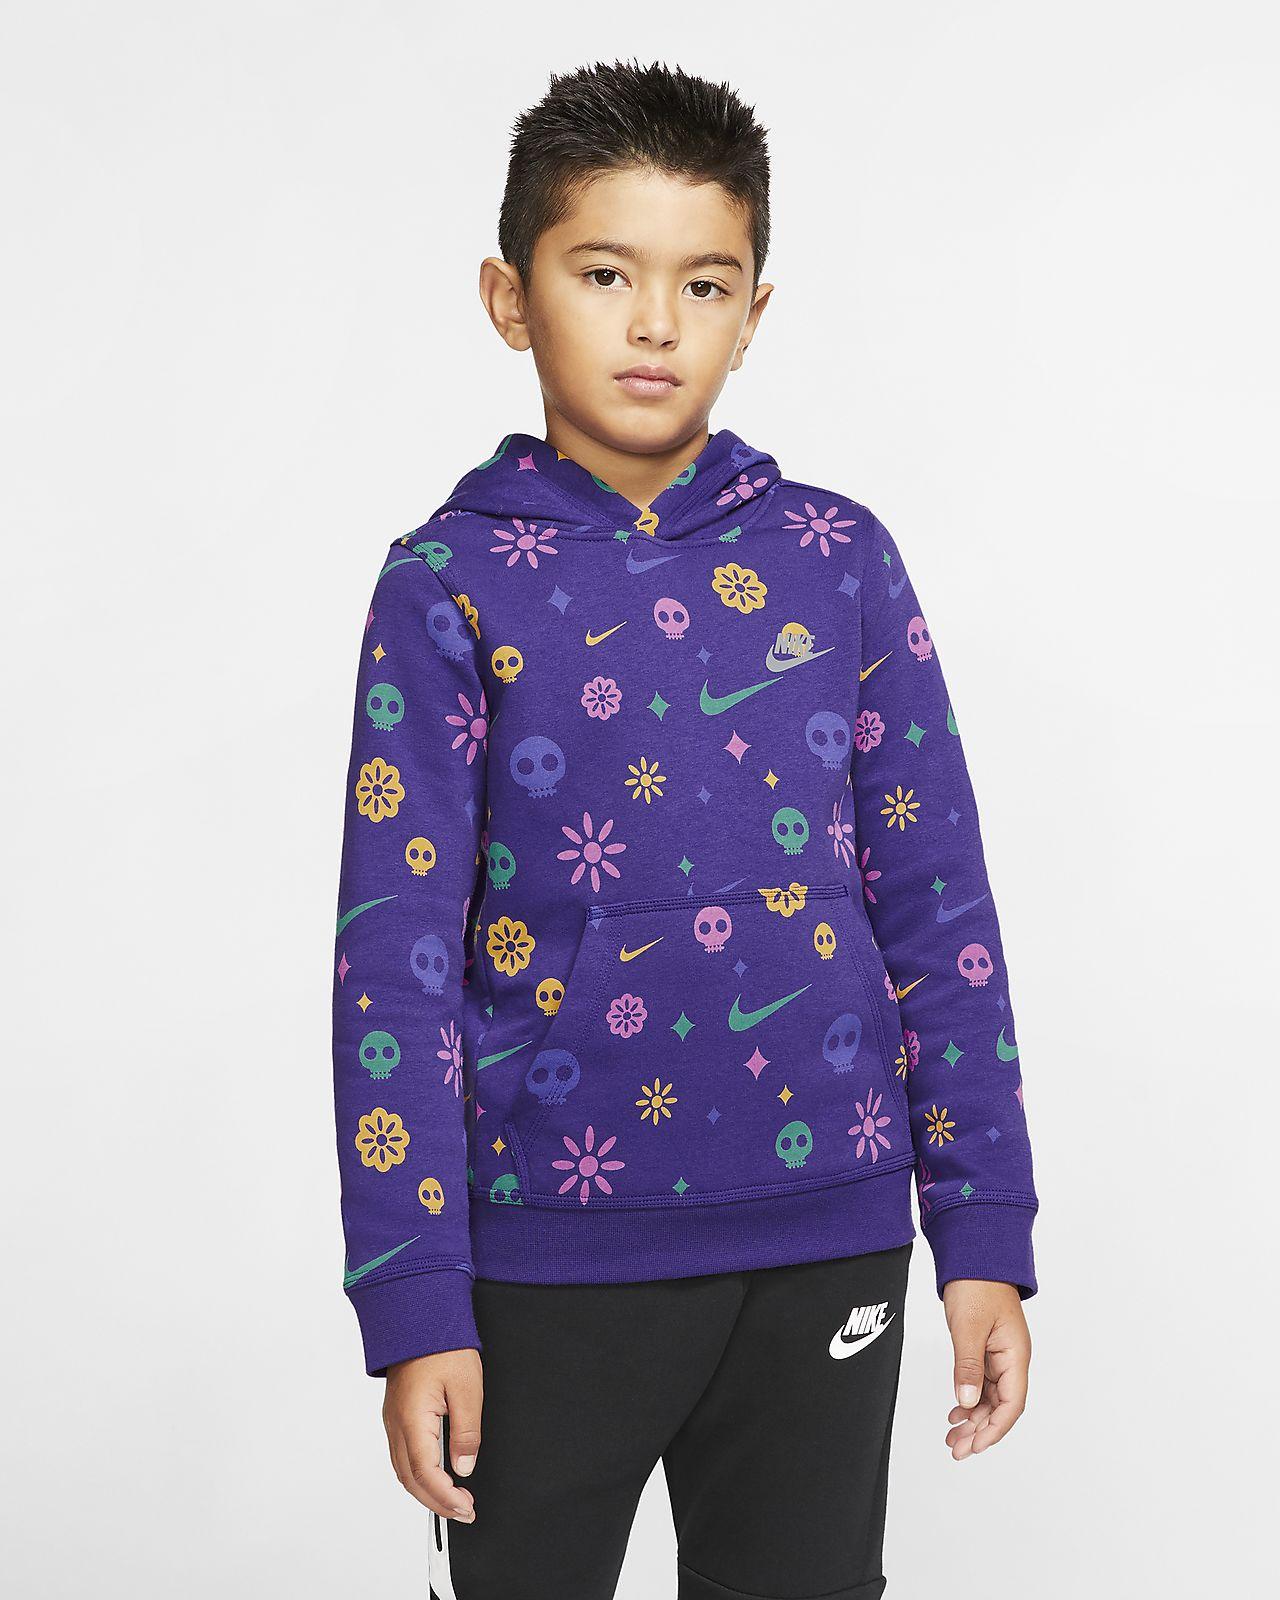 nike hoodie youth xl